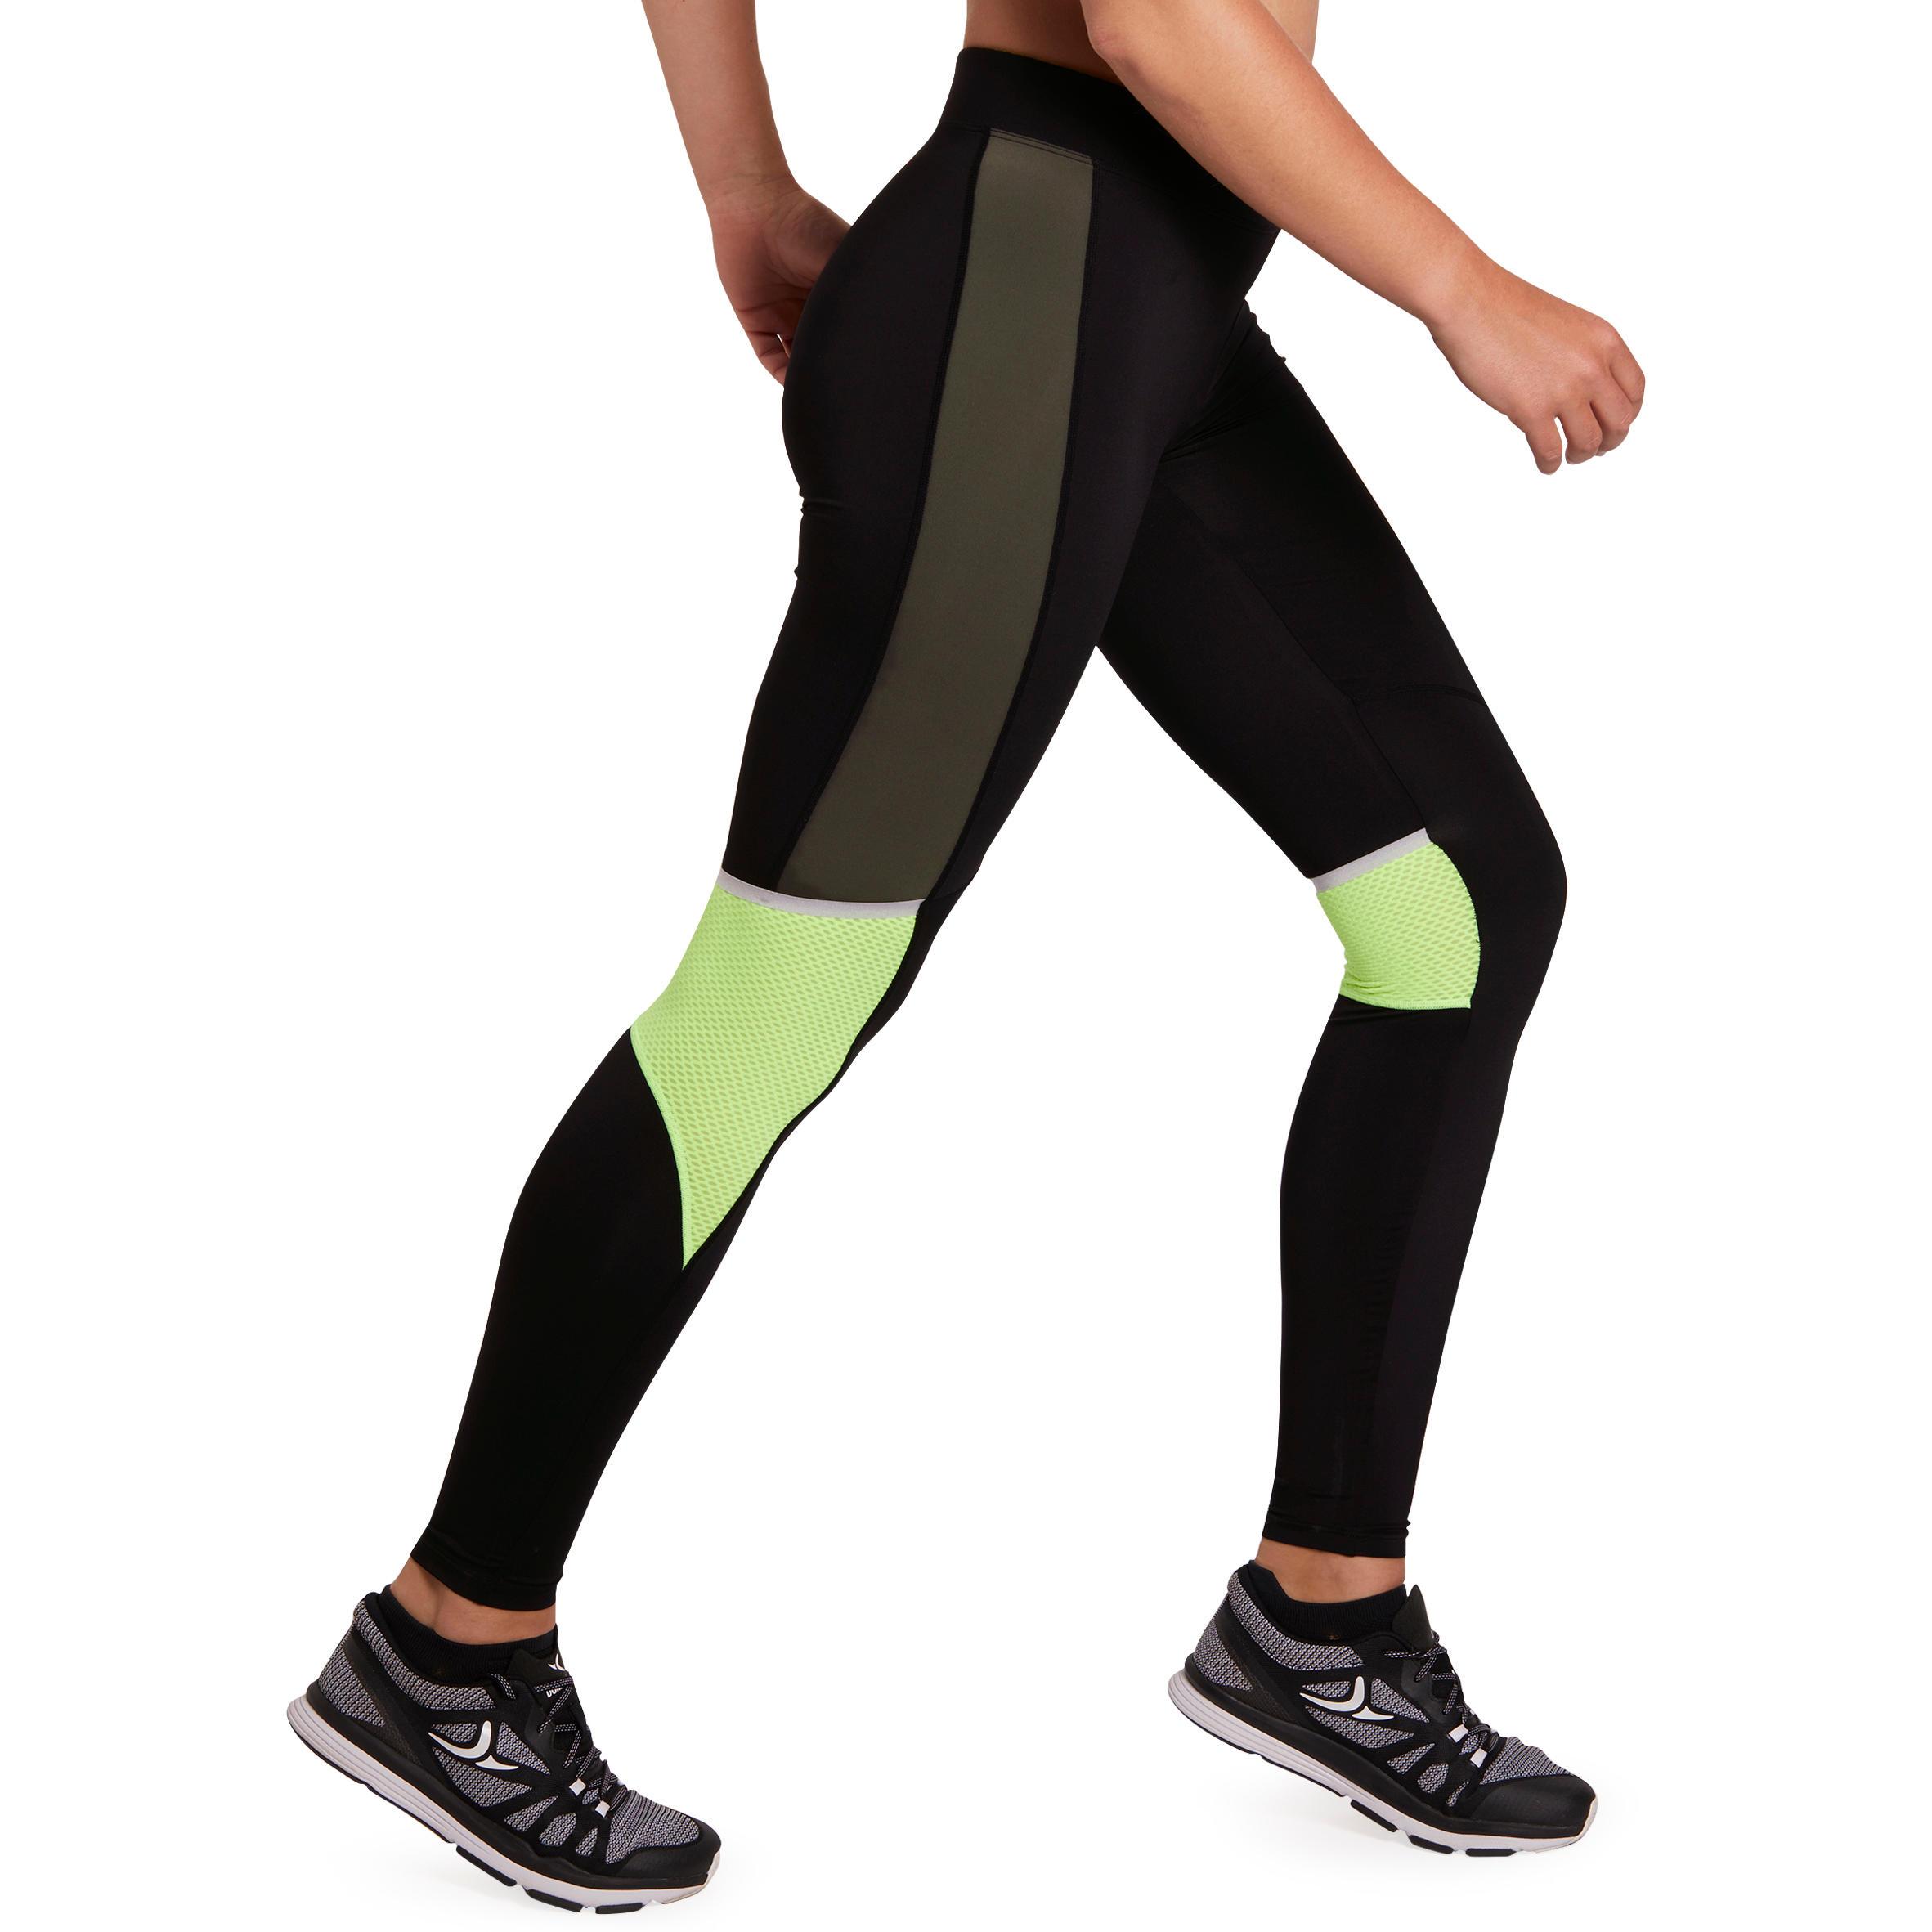 Women's fitness cardio energy extreme printed leggings -khaki black